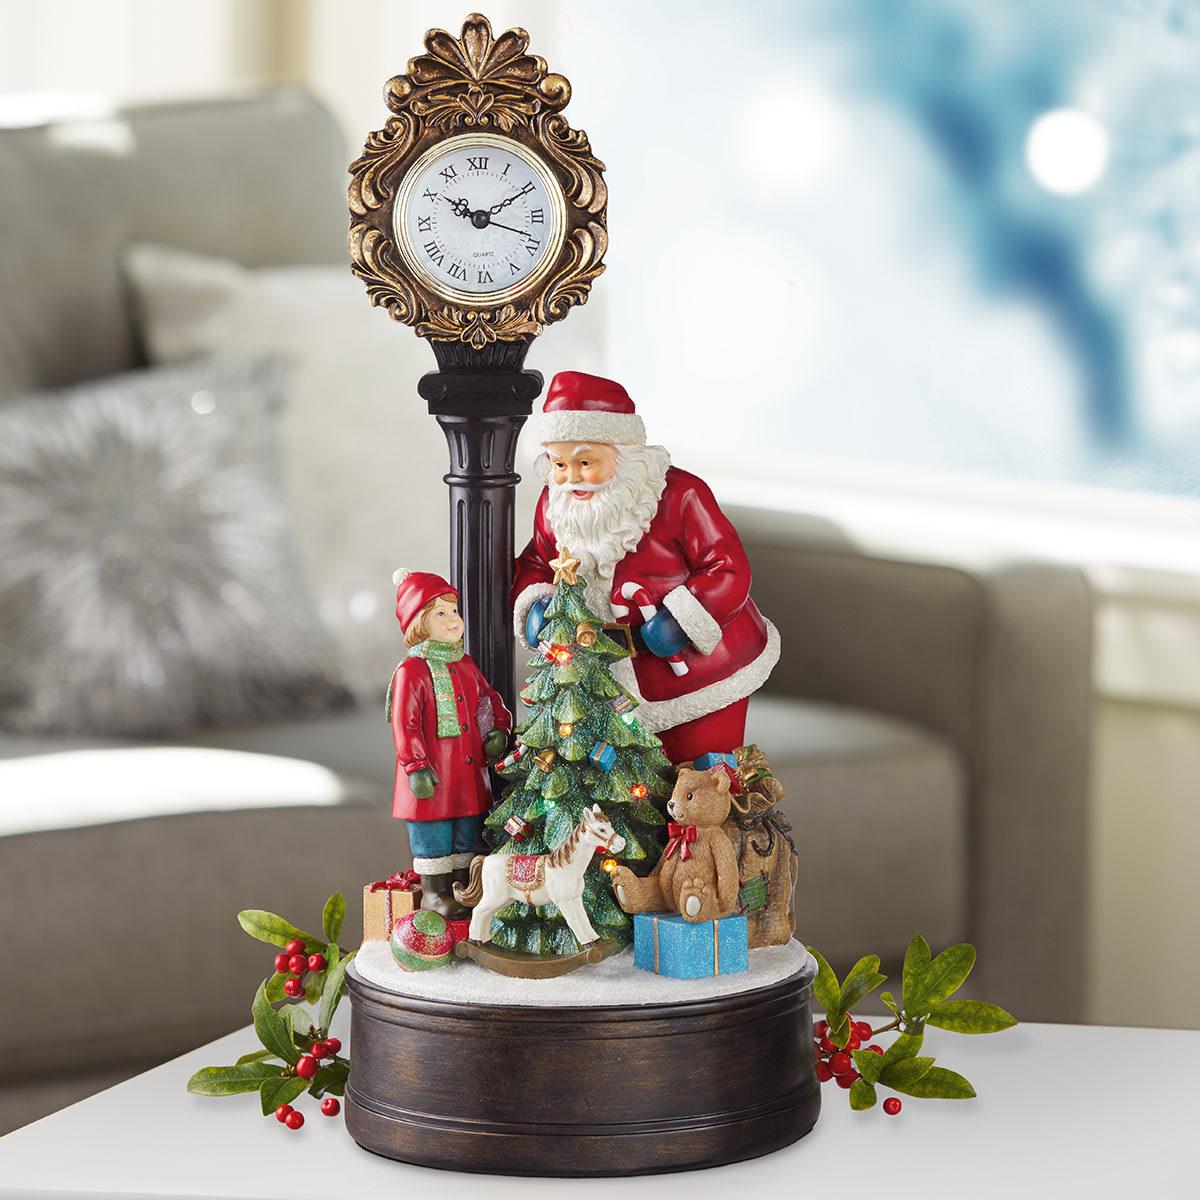 20 Inch 51 Cm Christmas Clock With Santa And Led Tree Costco Uk